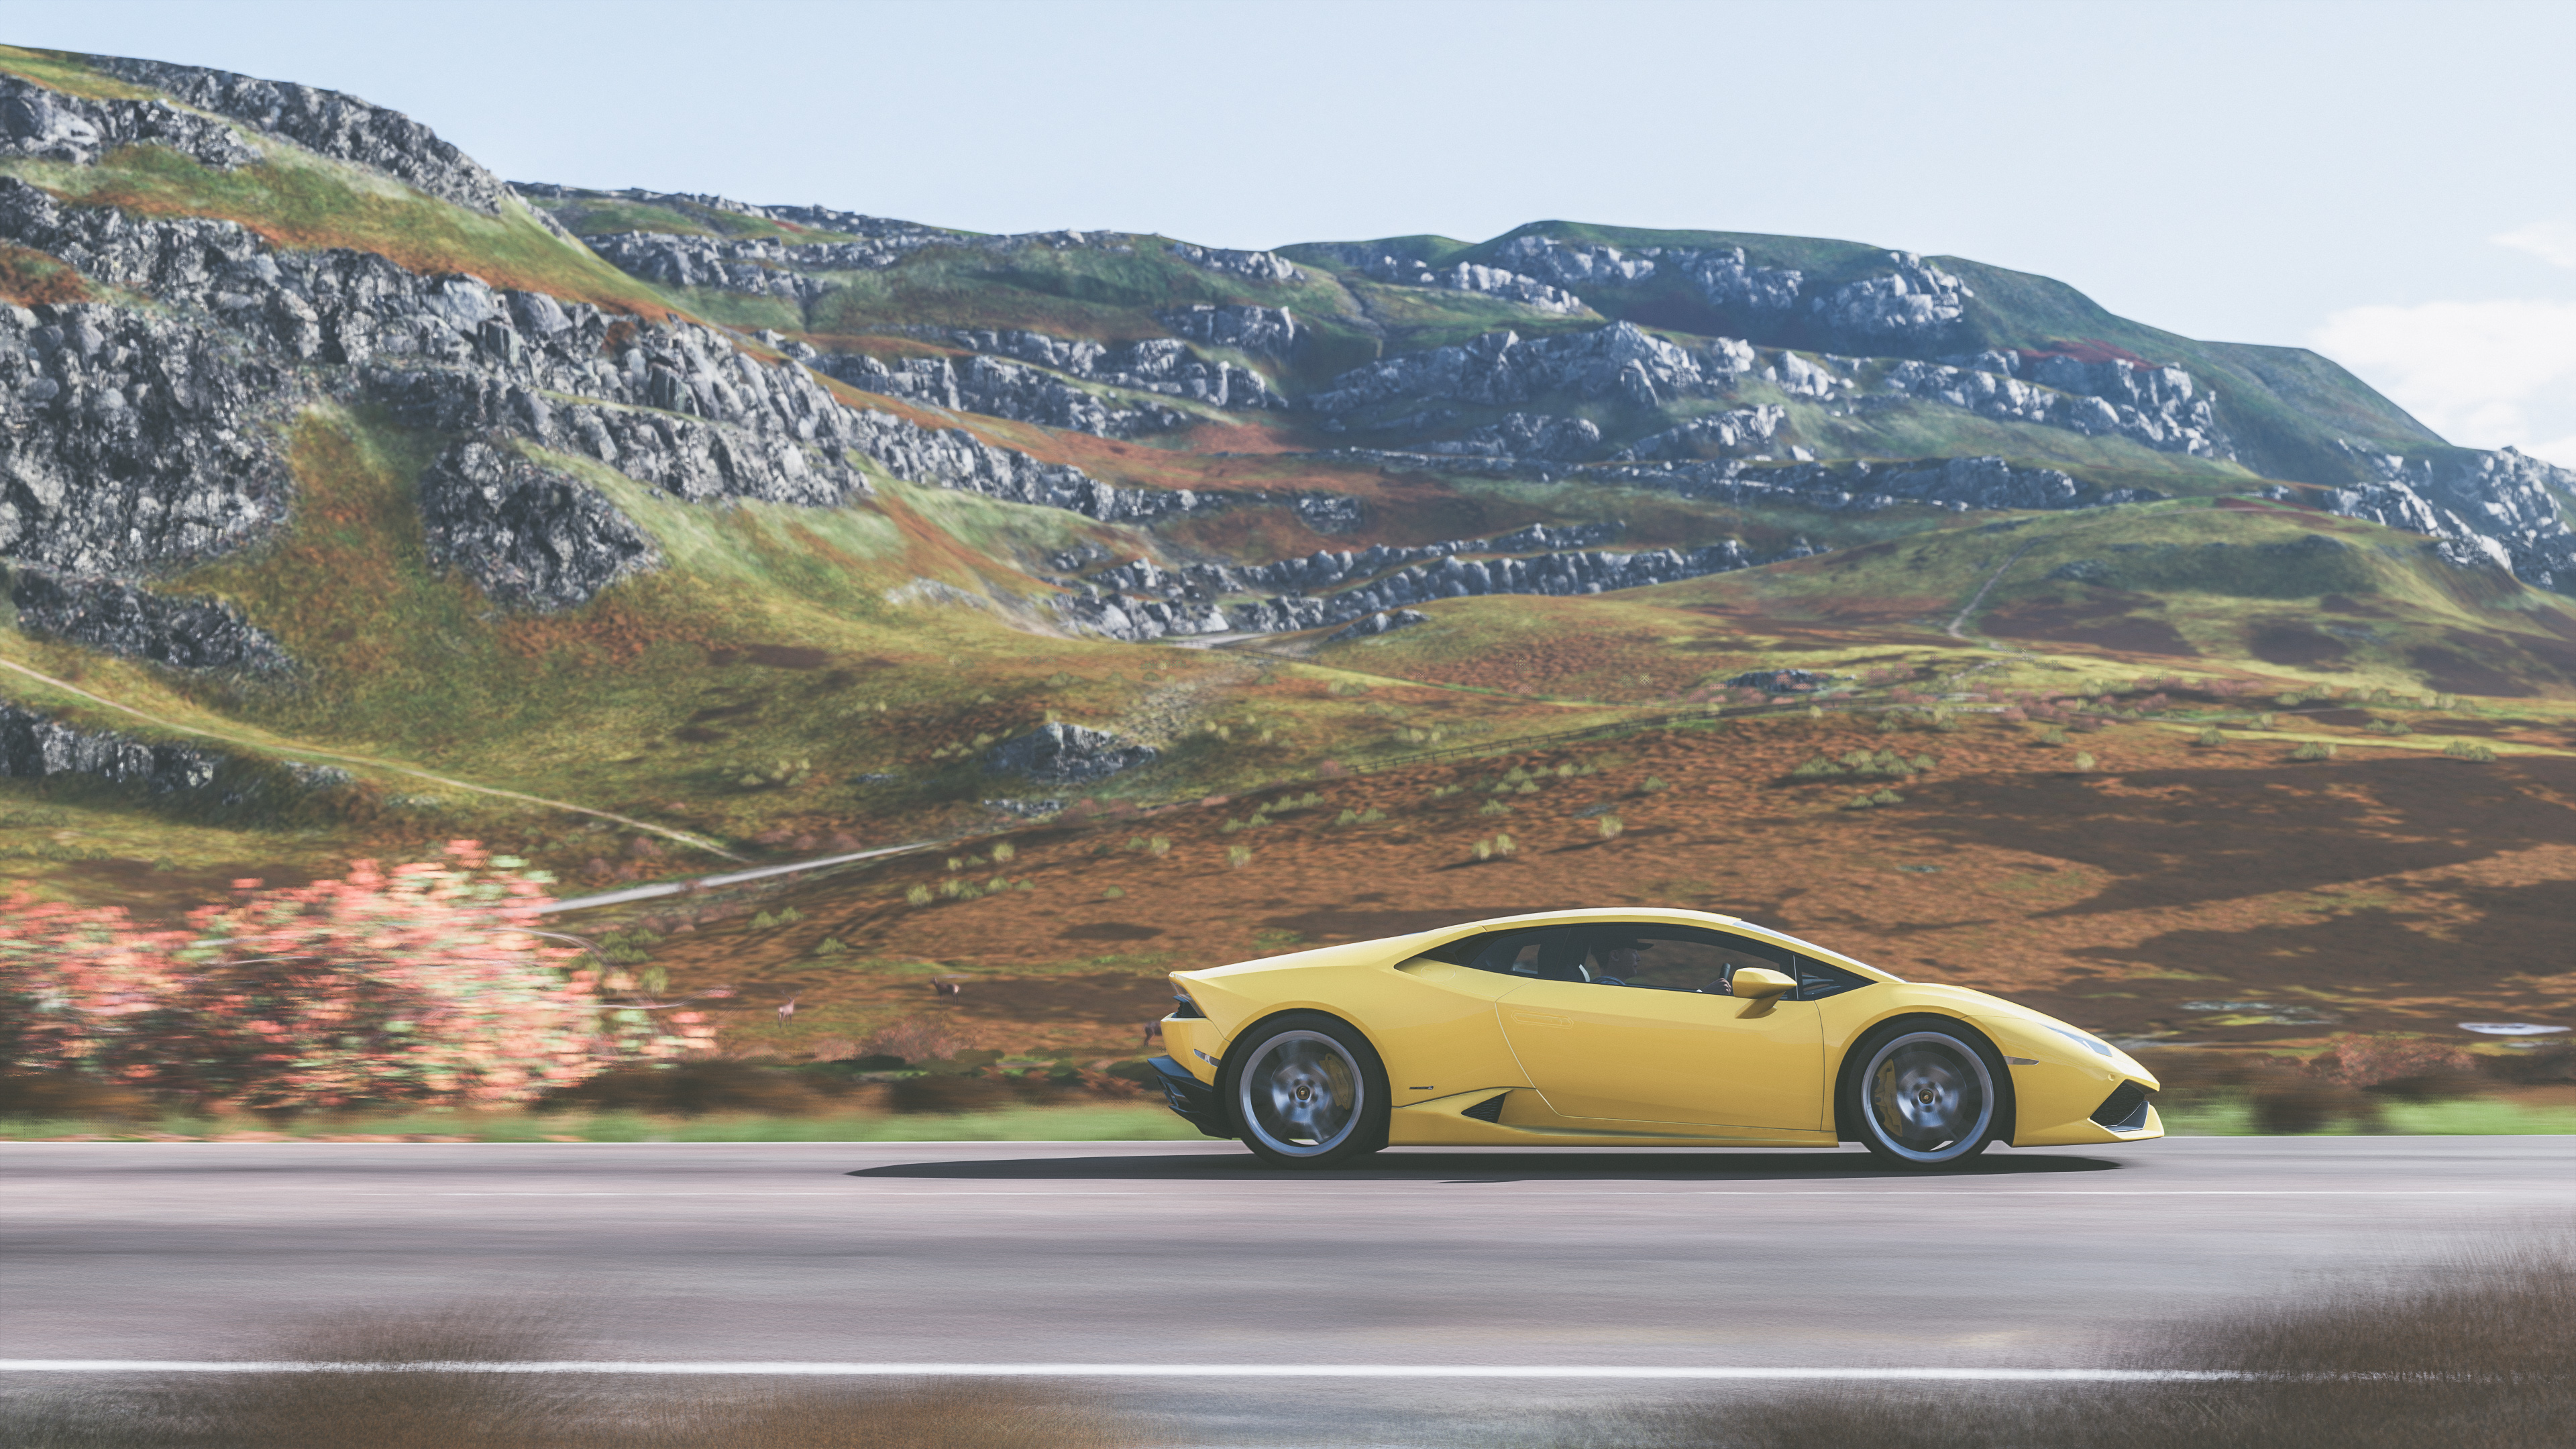 4k forza horizon 4 lamborghini huracan 1542494949 - 4k Forza Horizon 4 Lamborghini Huracan - hd-wallpapers, games wallpapers, forza wallpapers, forza horizon 4 wallpapers, 4k-wallpapers, 2018 games wallpapers